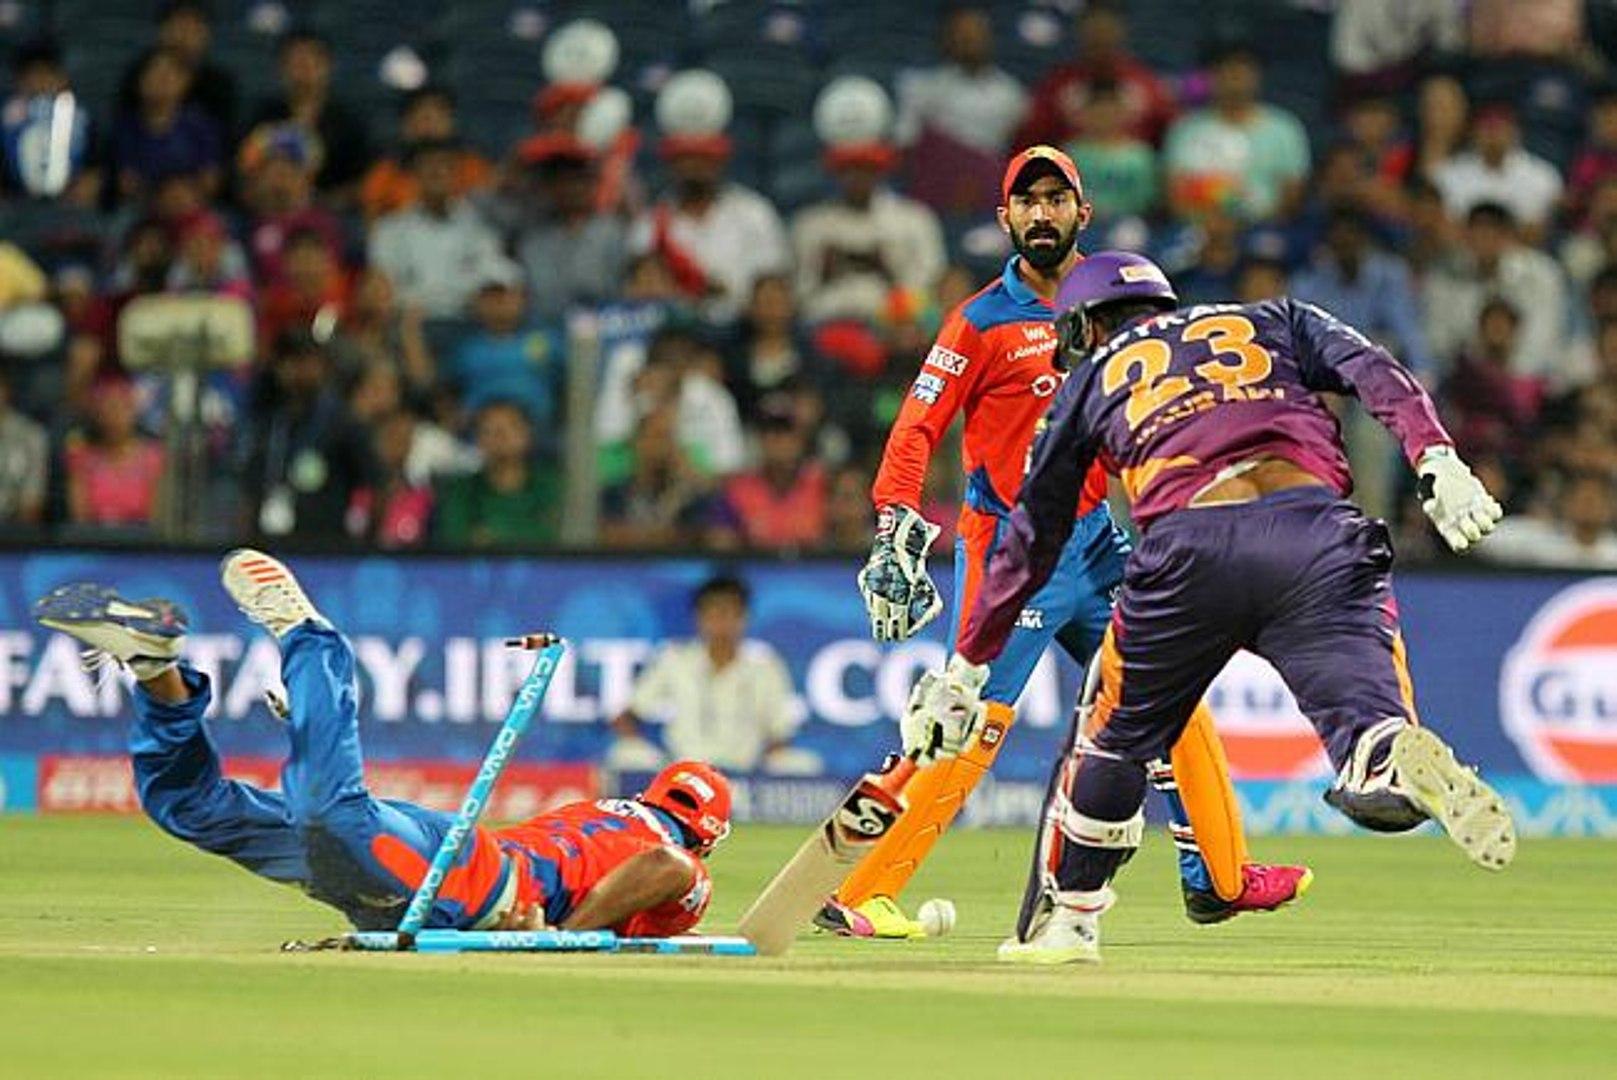 [VIVO IPL 2016] Rising Pune Supergiants vs Gujrat Lions 2016 || RPS vs GI Match 2016